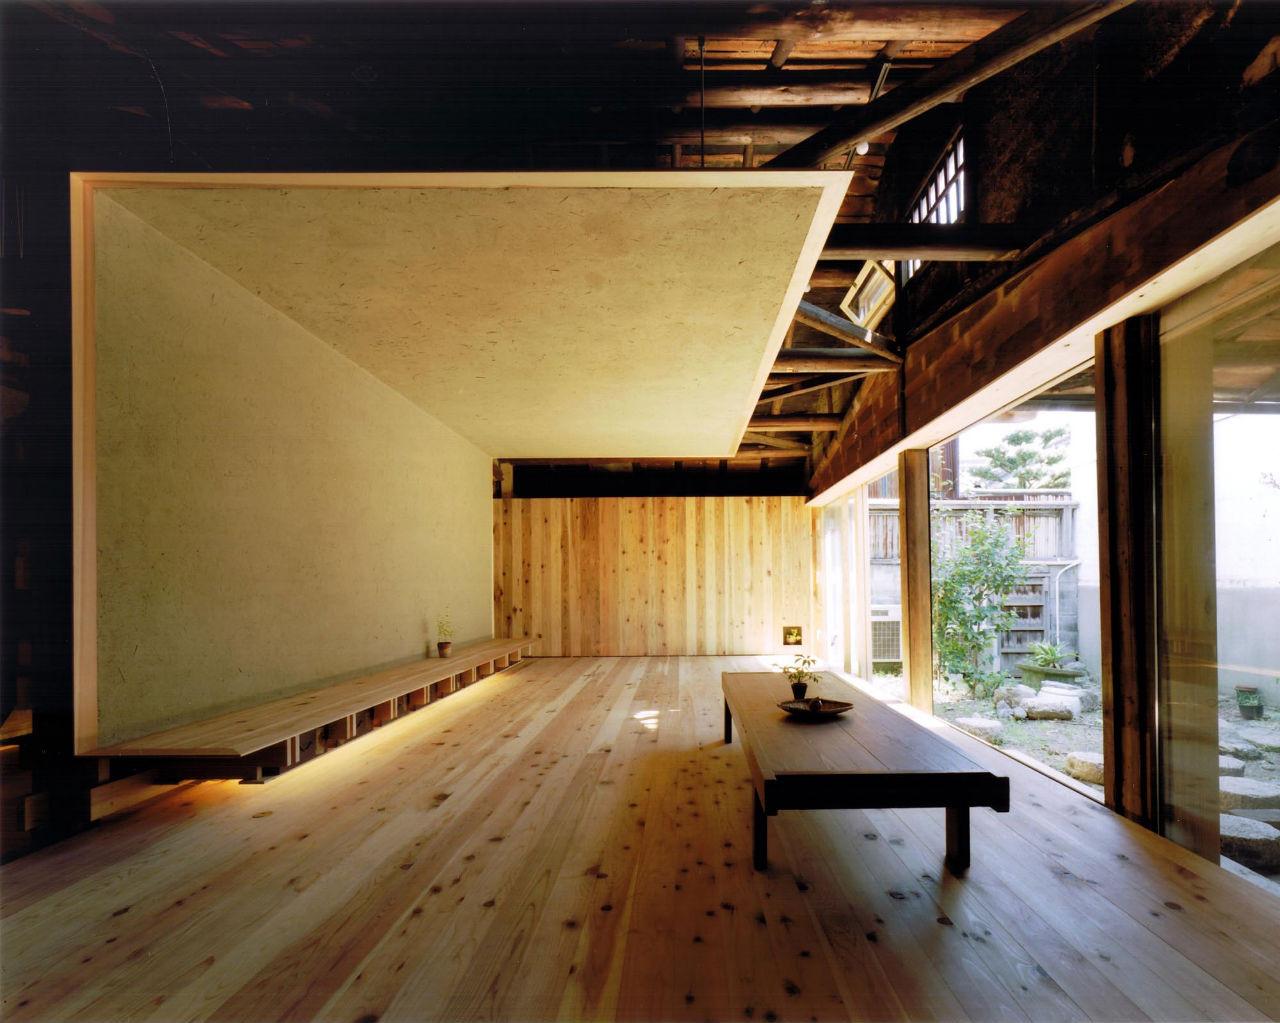 Robert A.M. Stern Awards Master Student with $10,000 Travel Fellowship, Wood Old House / Tadashi Yoshimura Architects © Hitoshi Kawamoto